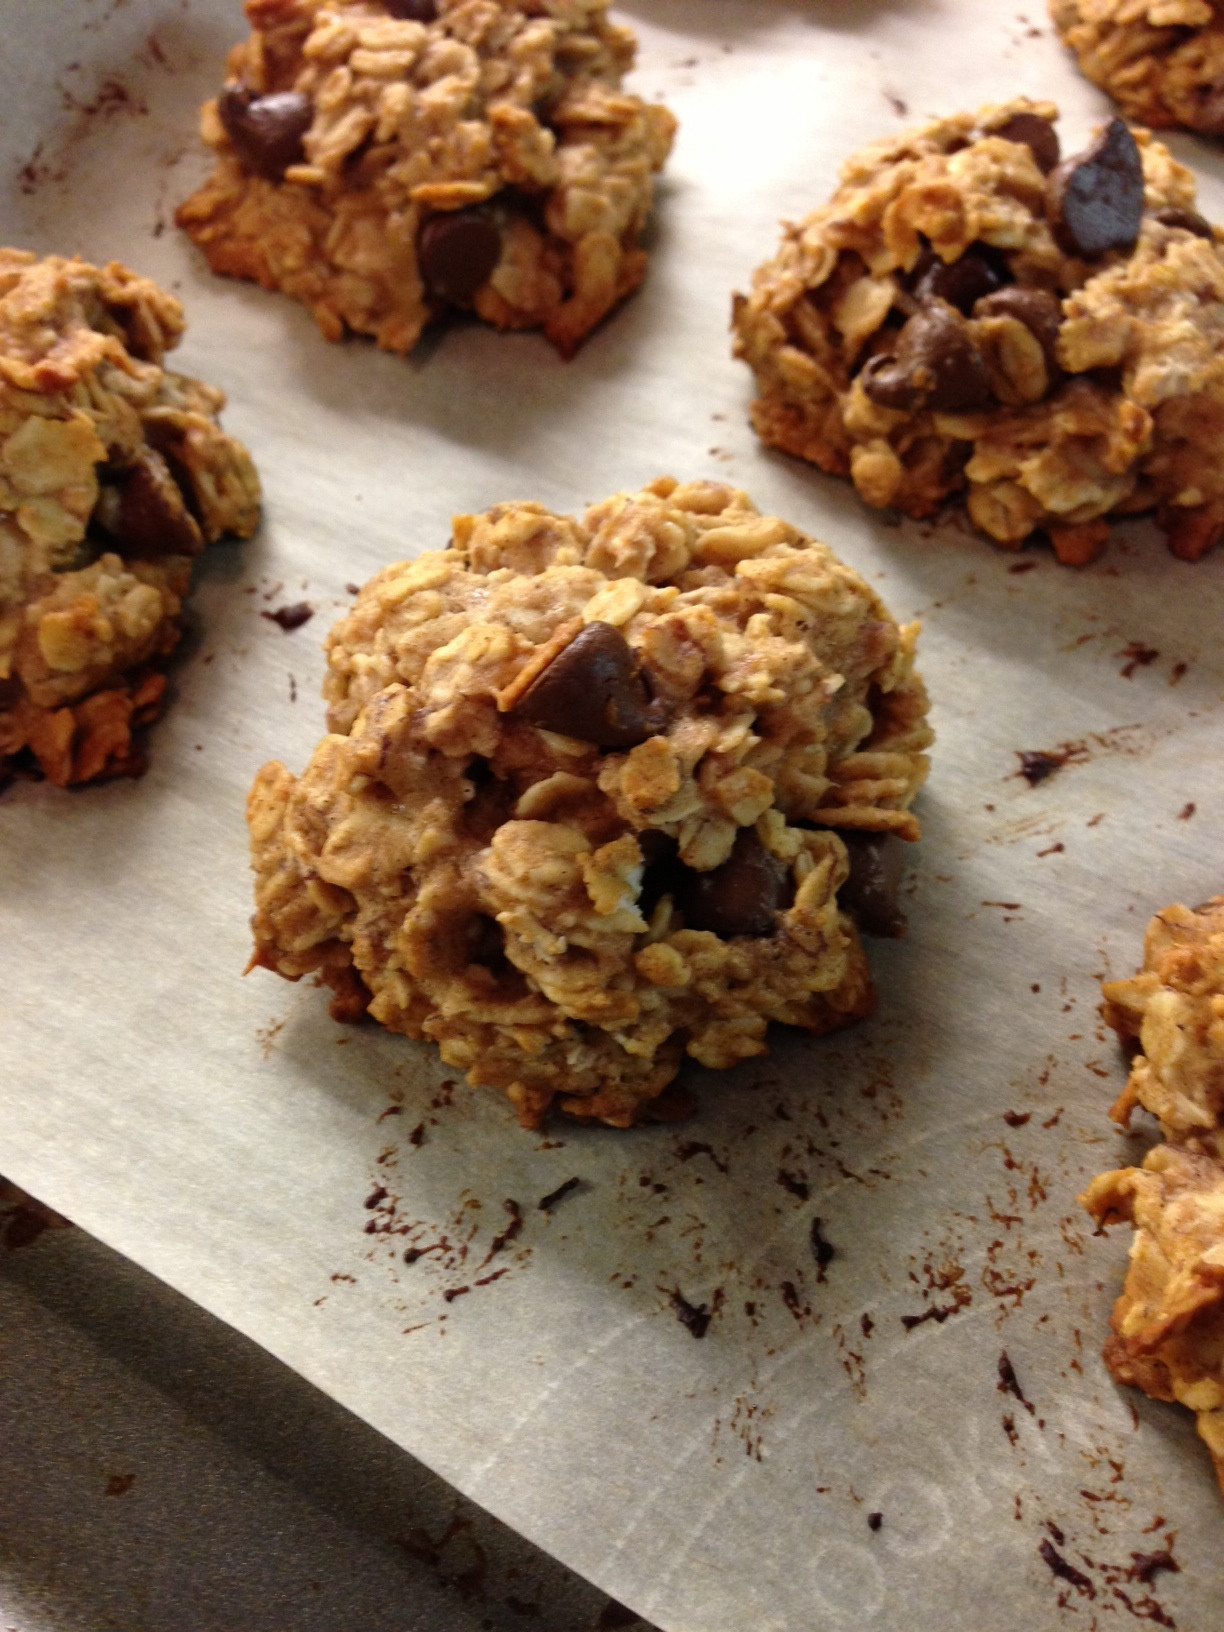 Healthy Homemade Oatmeal Cookies  Healthy Oatmeal Chocolate Chip Cookies Lauren Follett